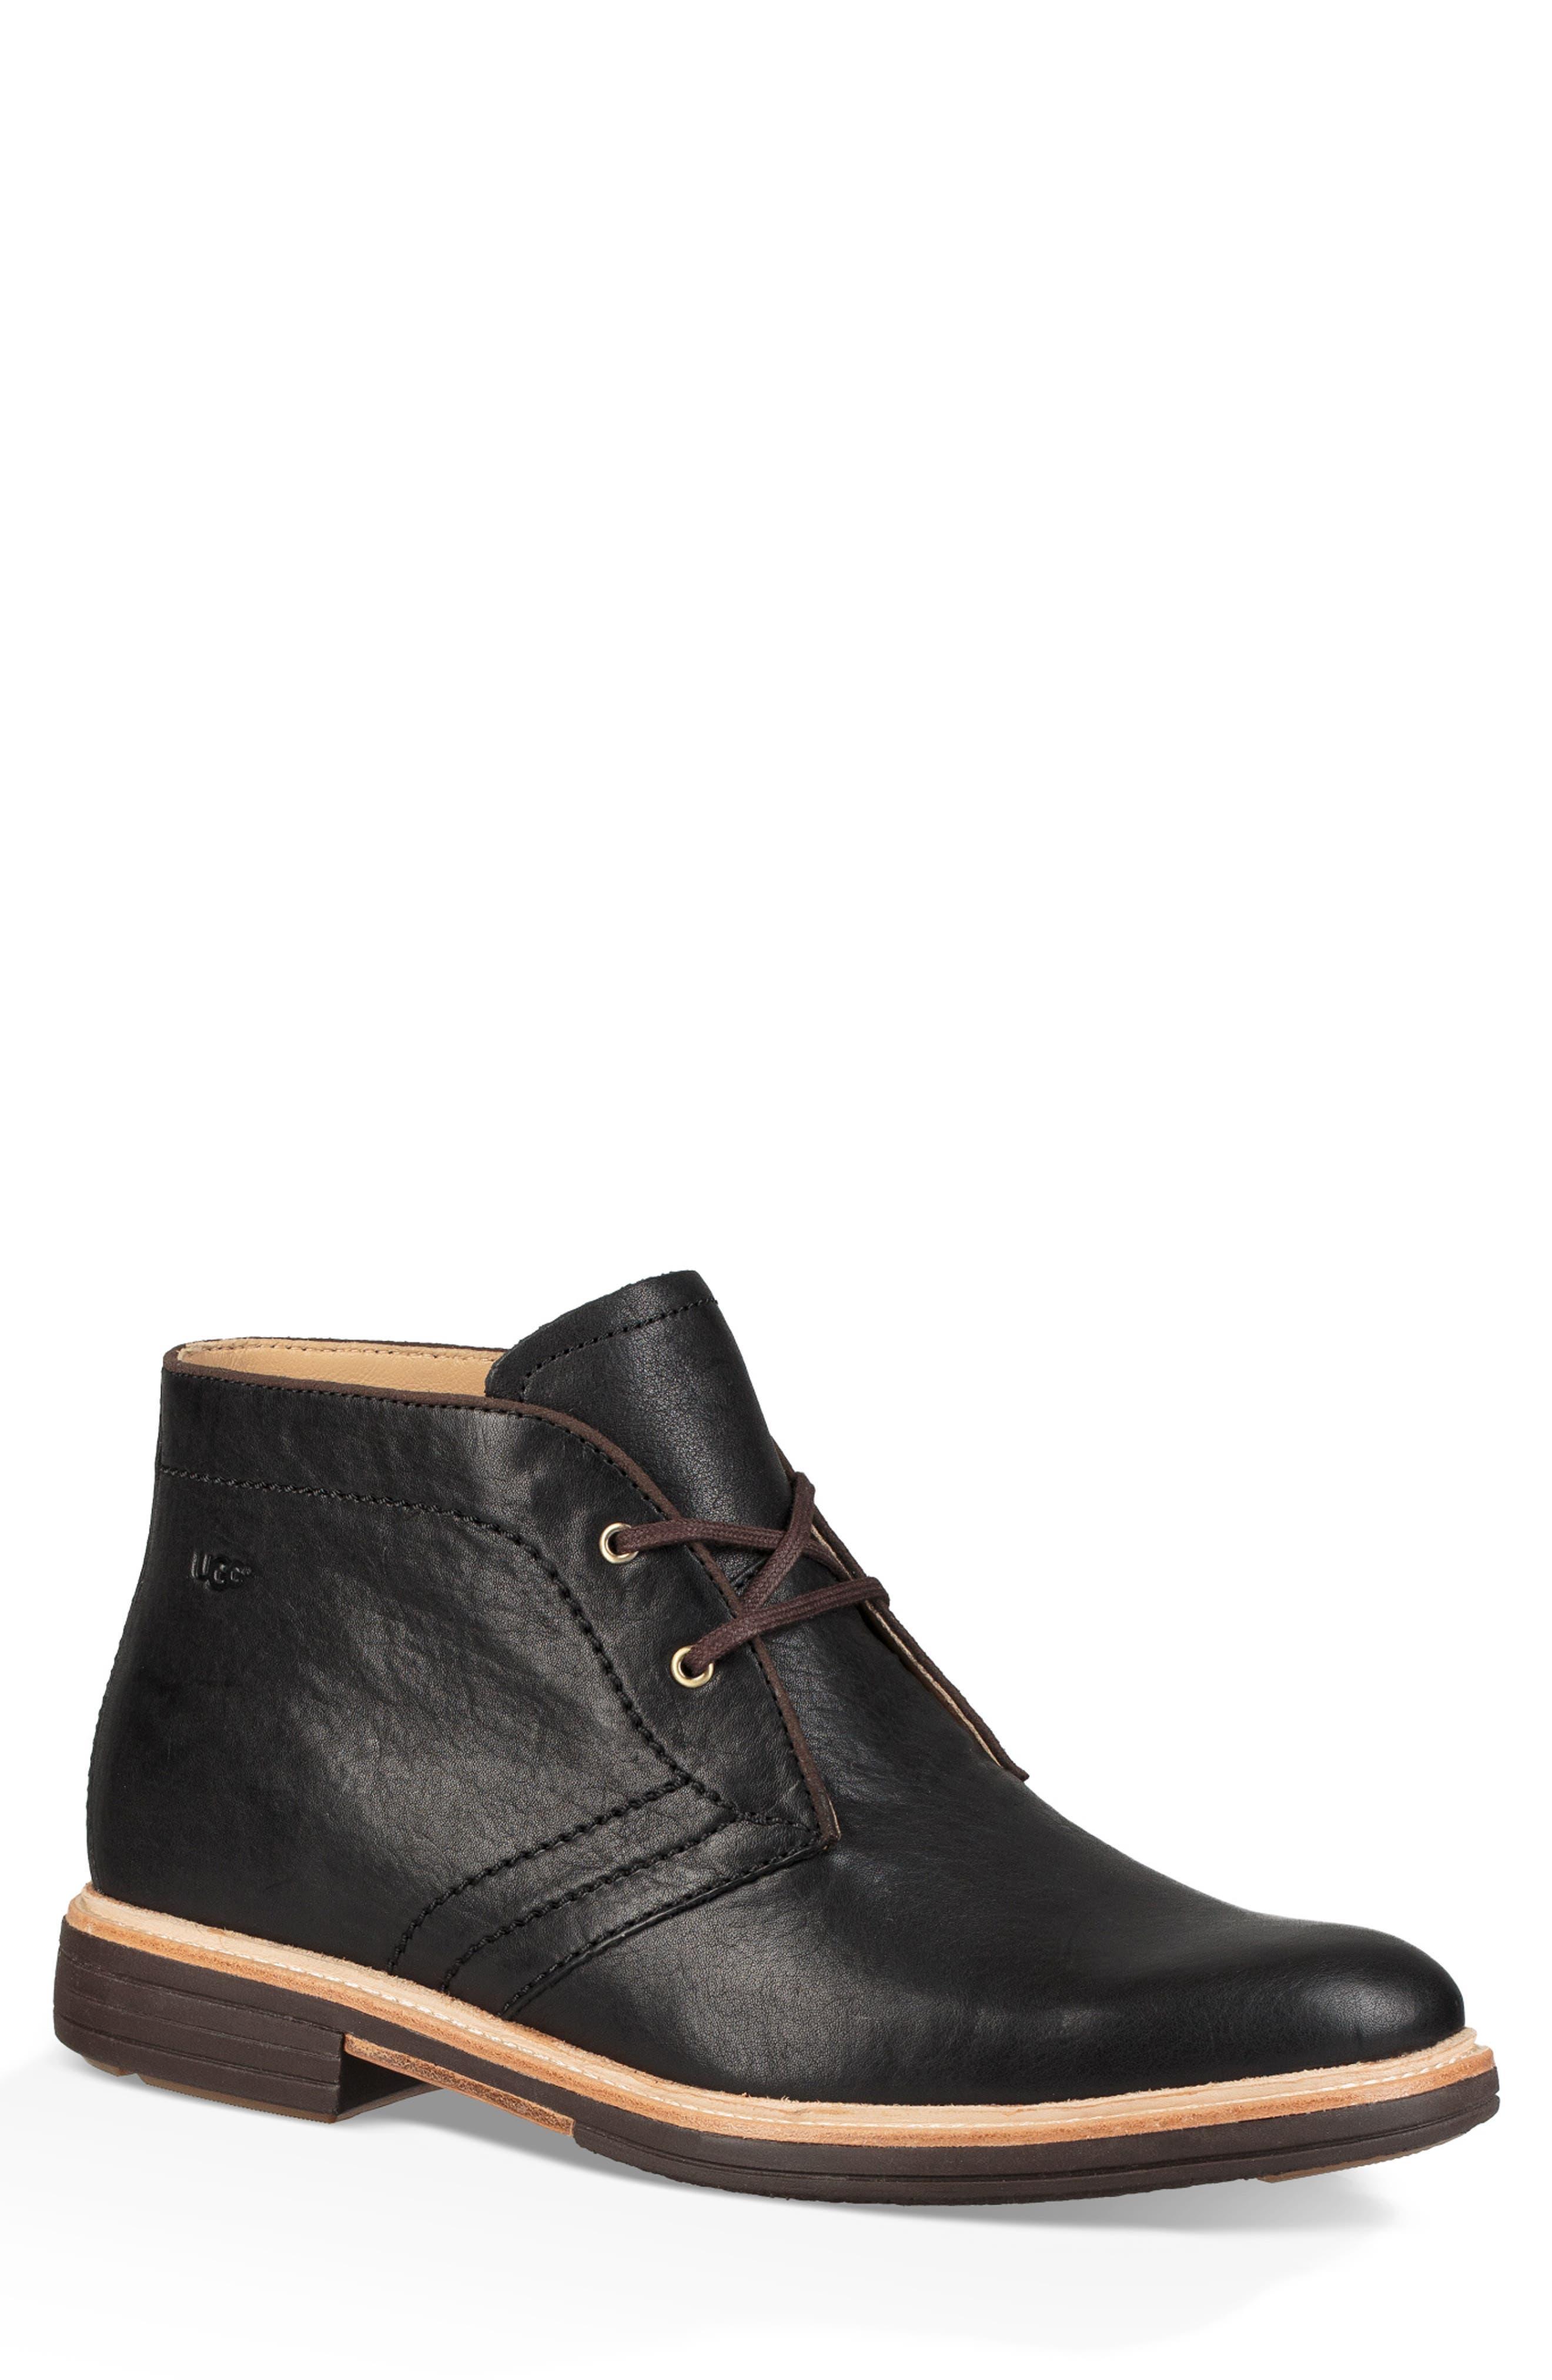 Ugg Australia Dagmann Chukka Boot, Black